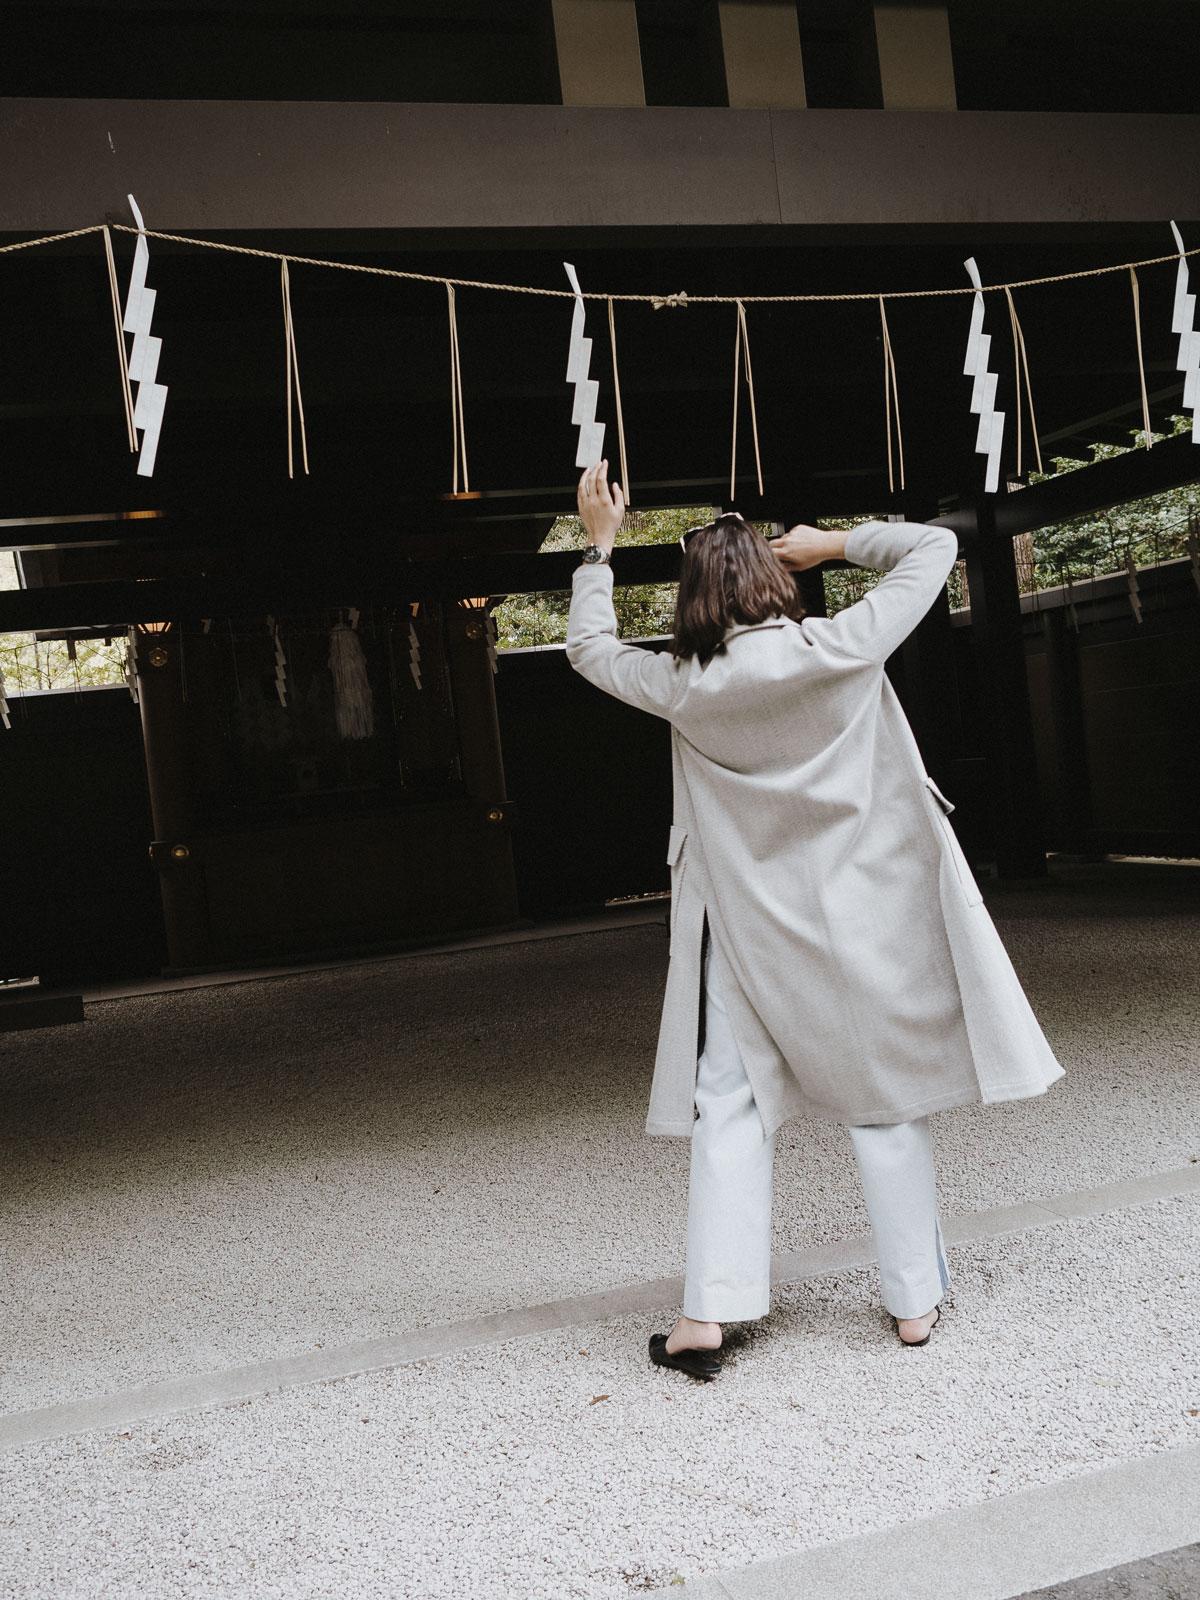 charlie-may-kuro-tokyo-japan-meiji-shrine-temple-2-3